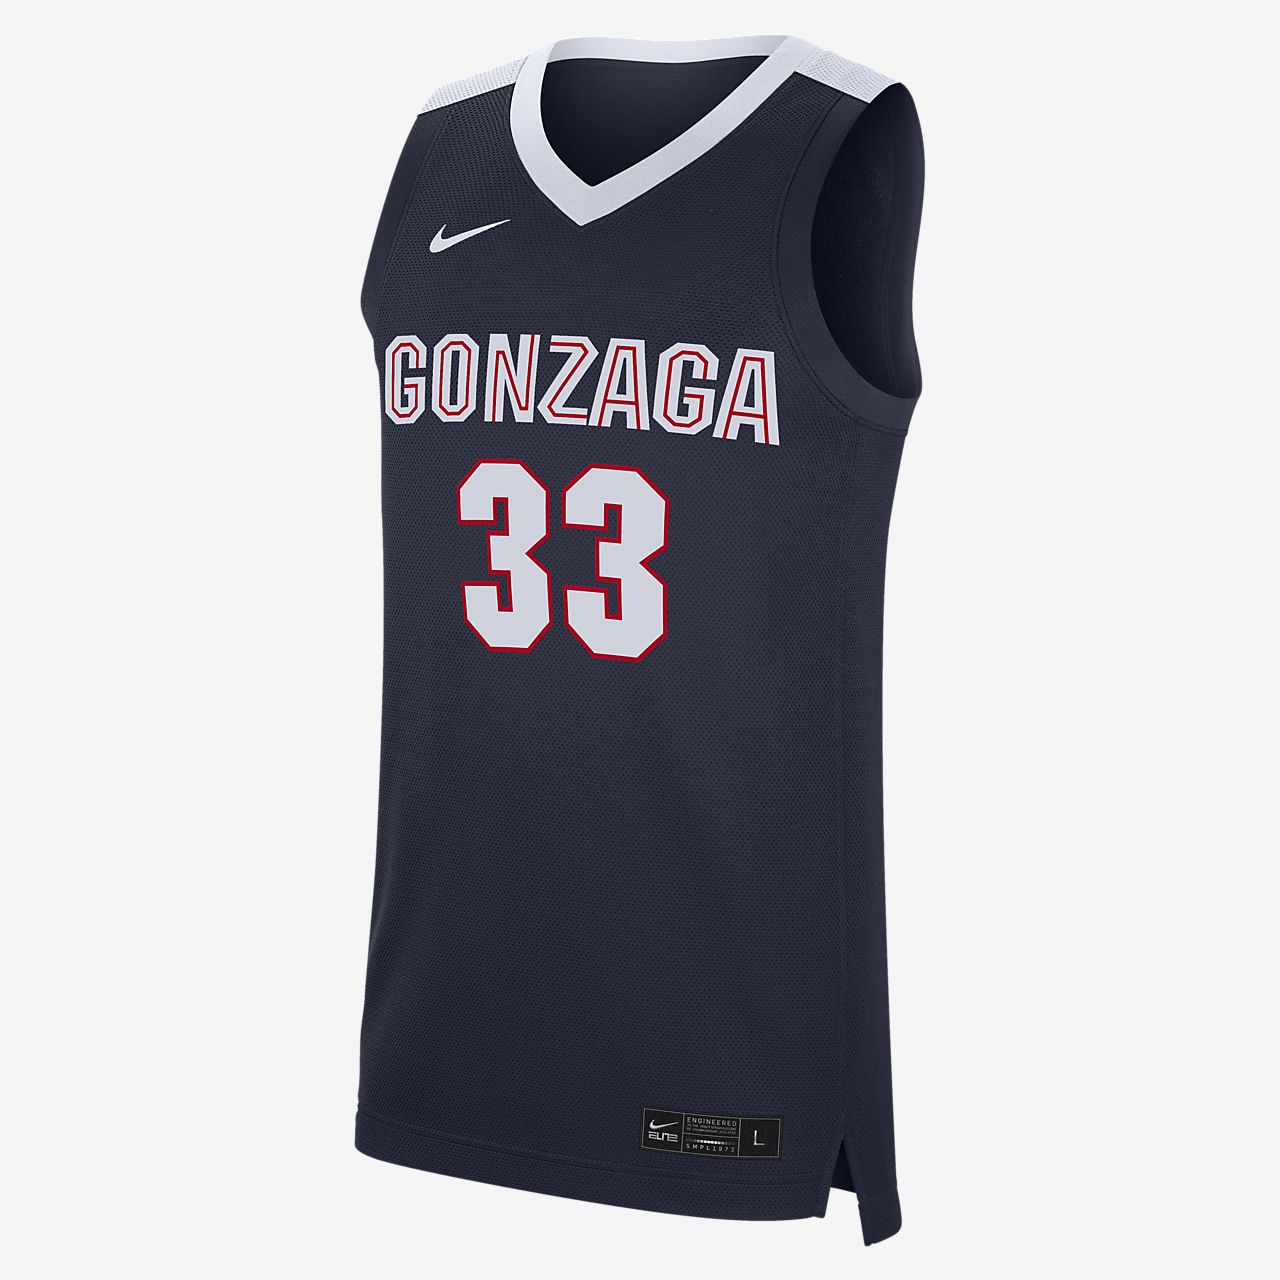 Nike College Replica (Gonzaga) Men's Basketball Jersey